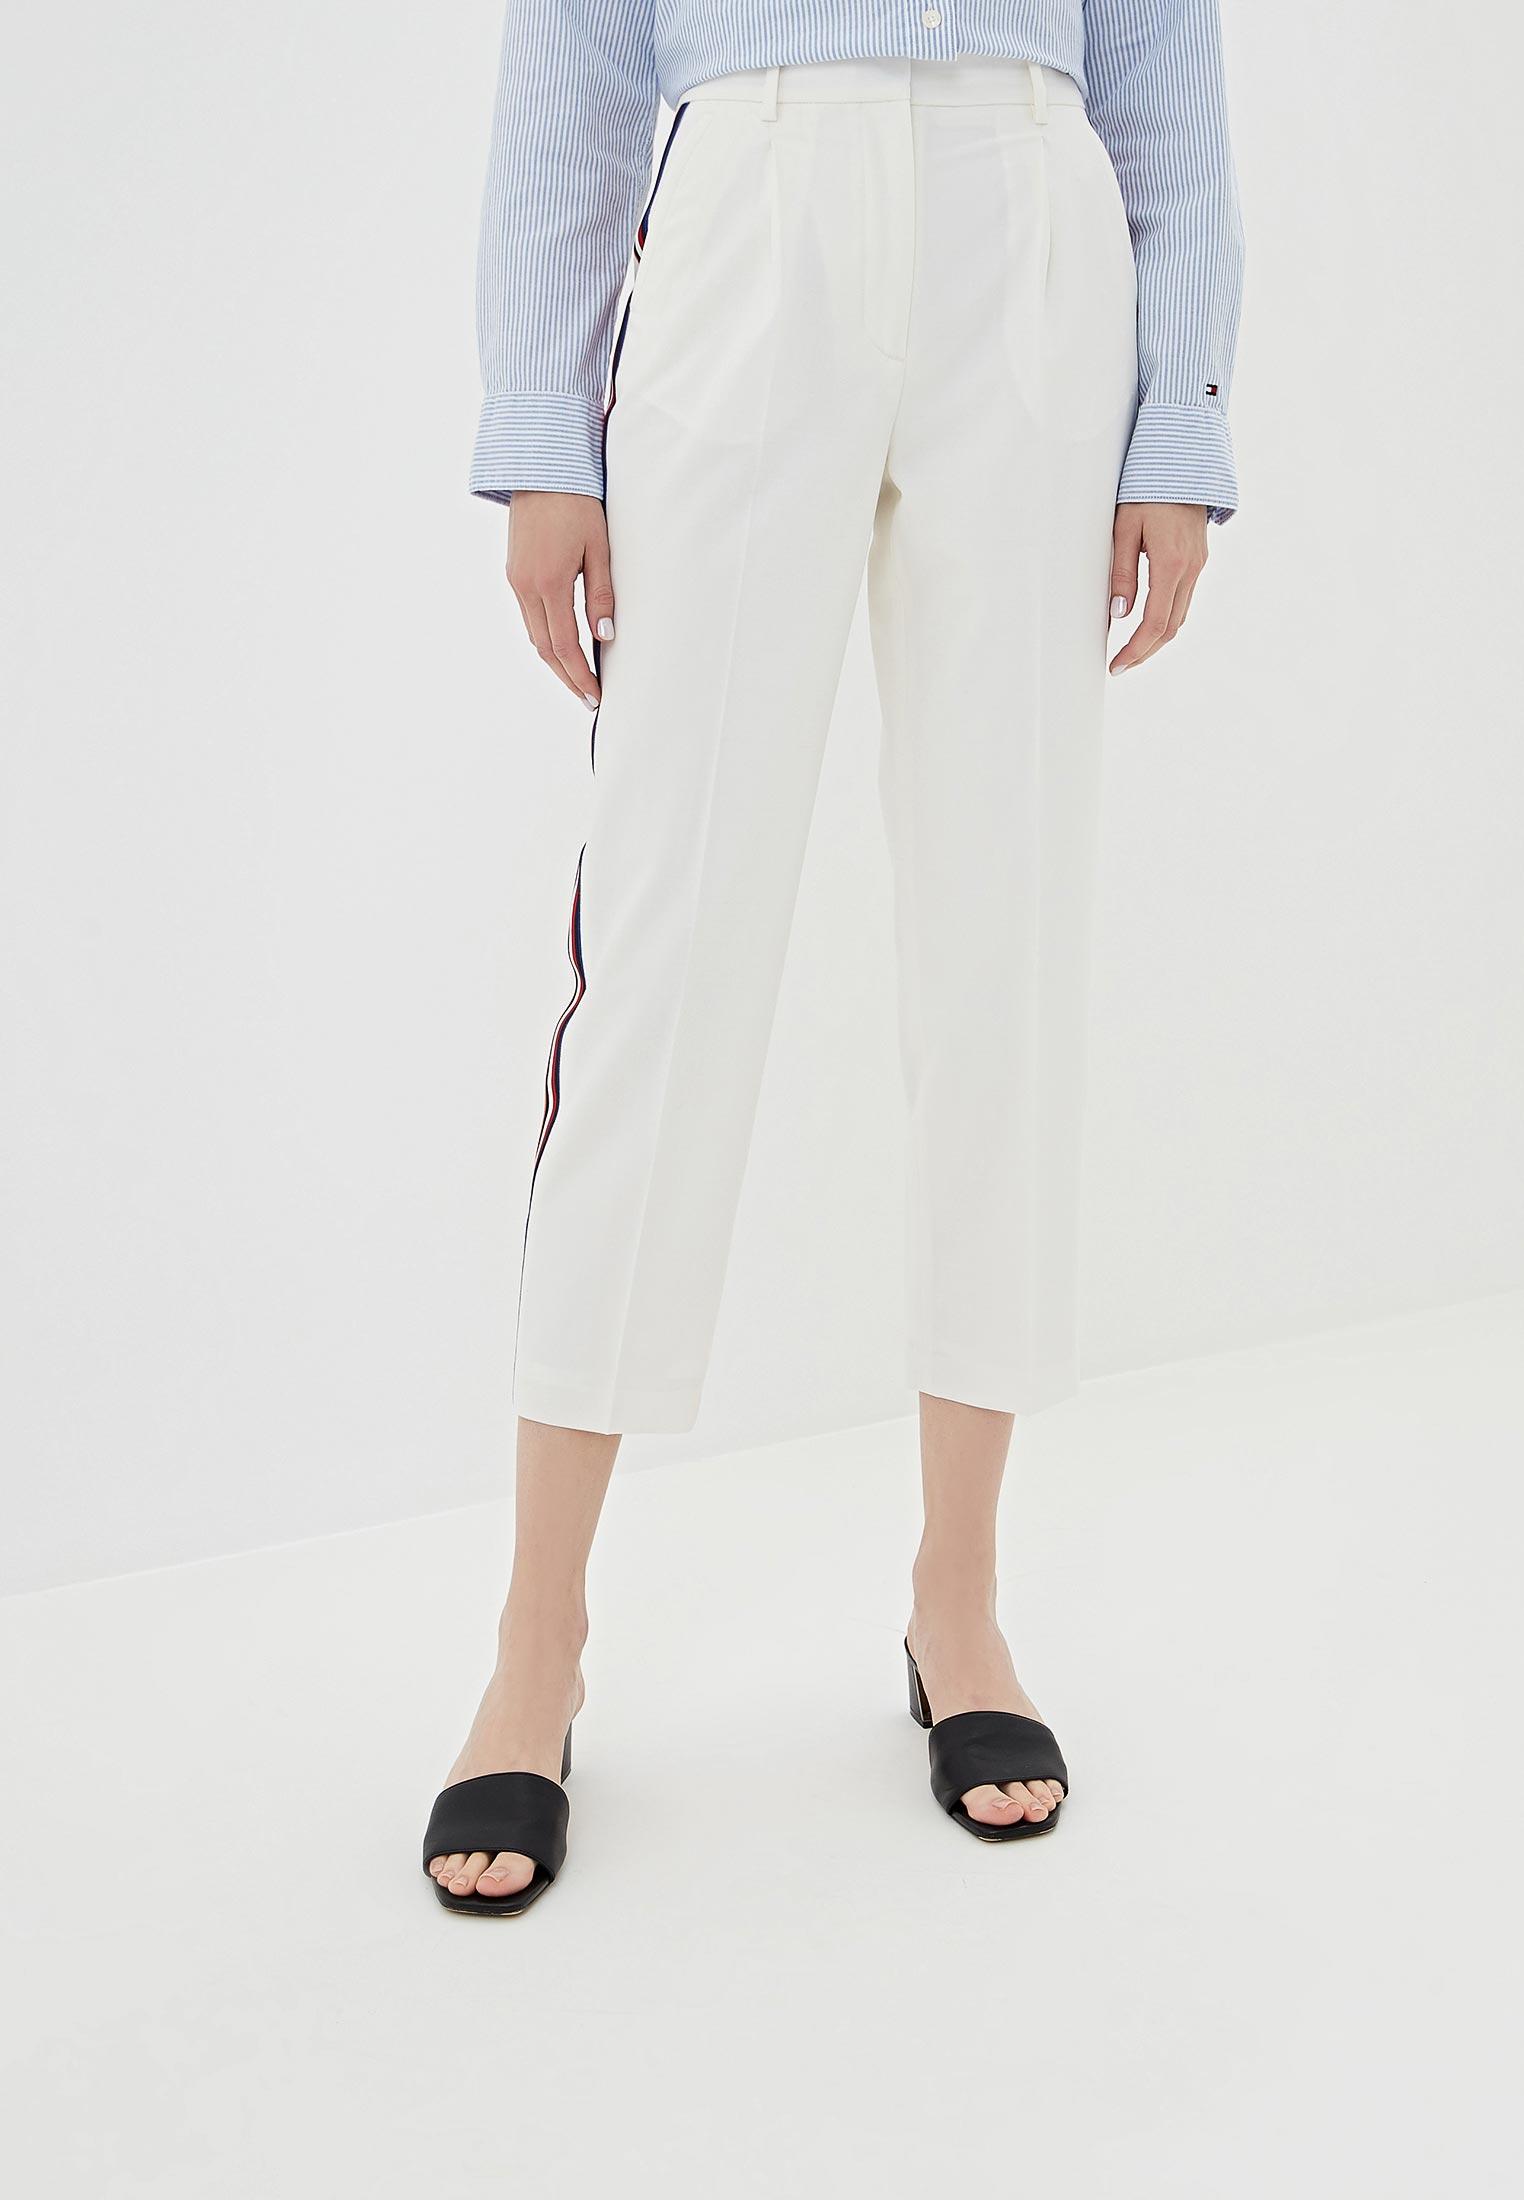 Женские классические брюки Tommy Hilfiger (Томми Хилфигер) WW0WW25066